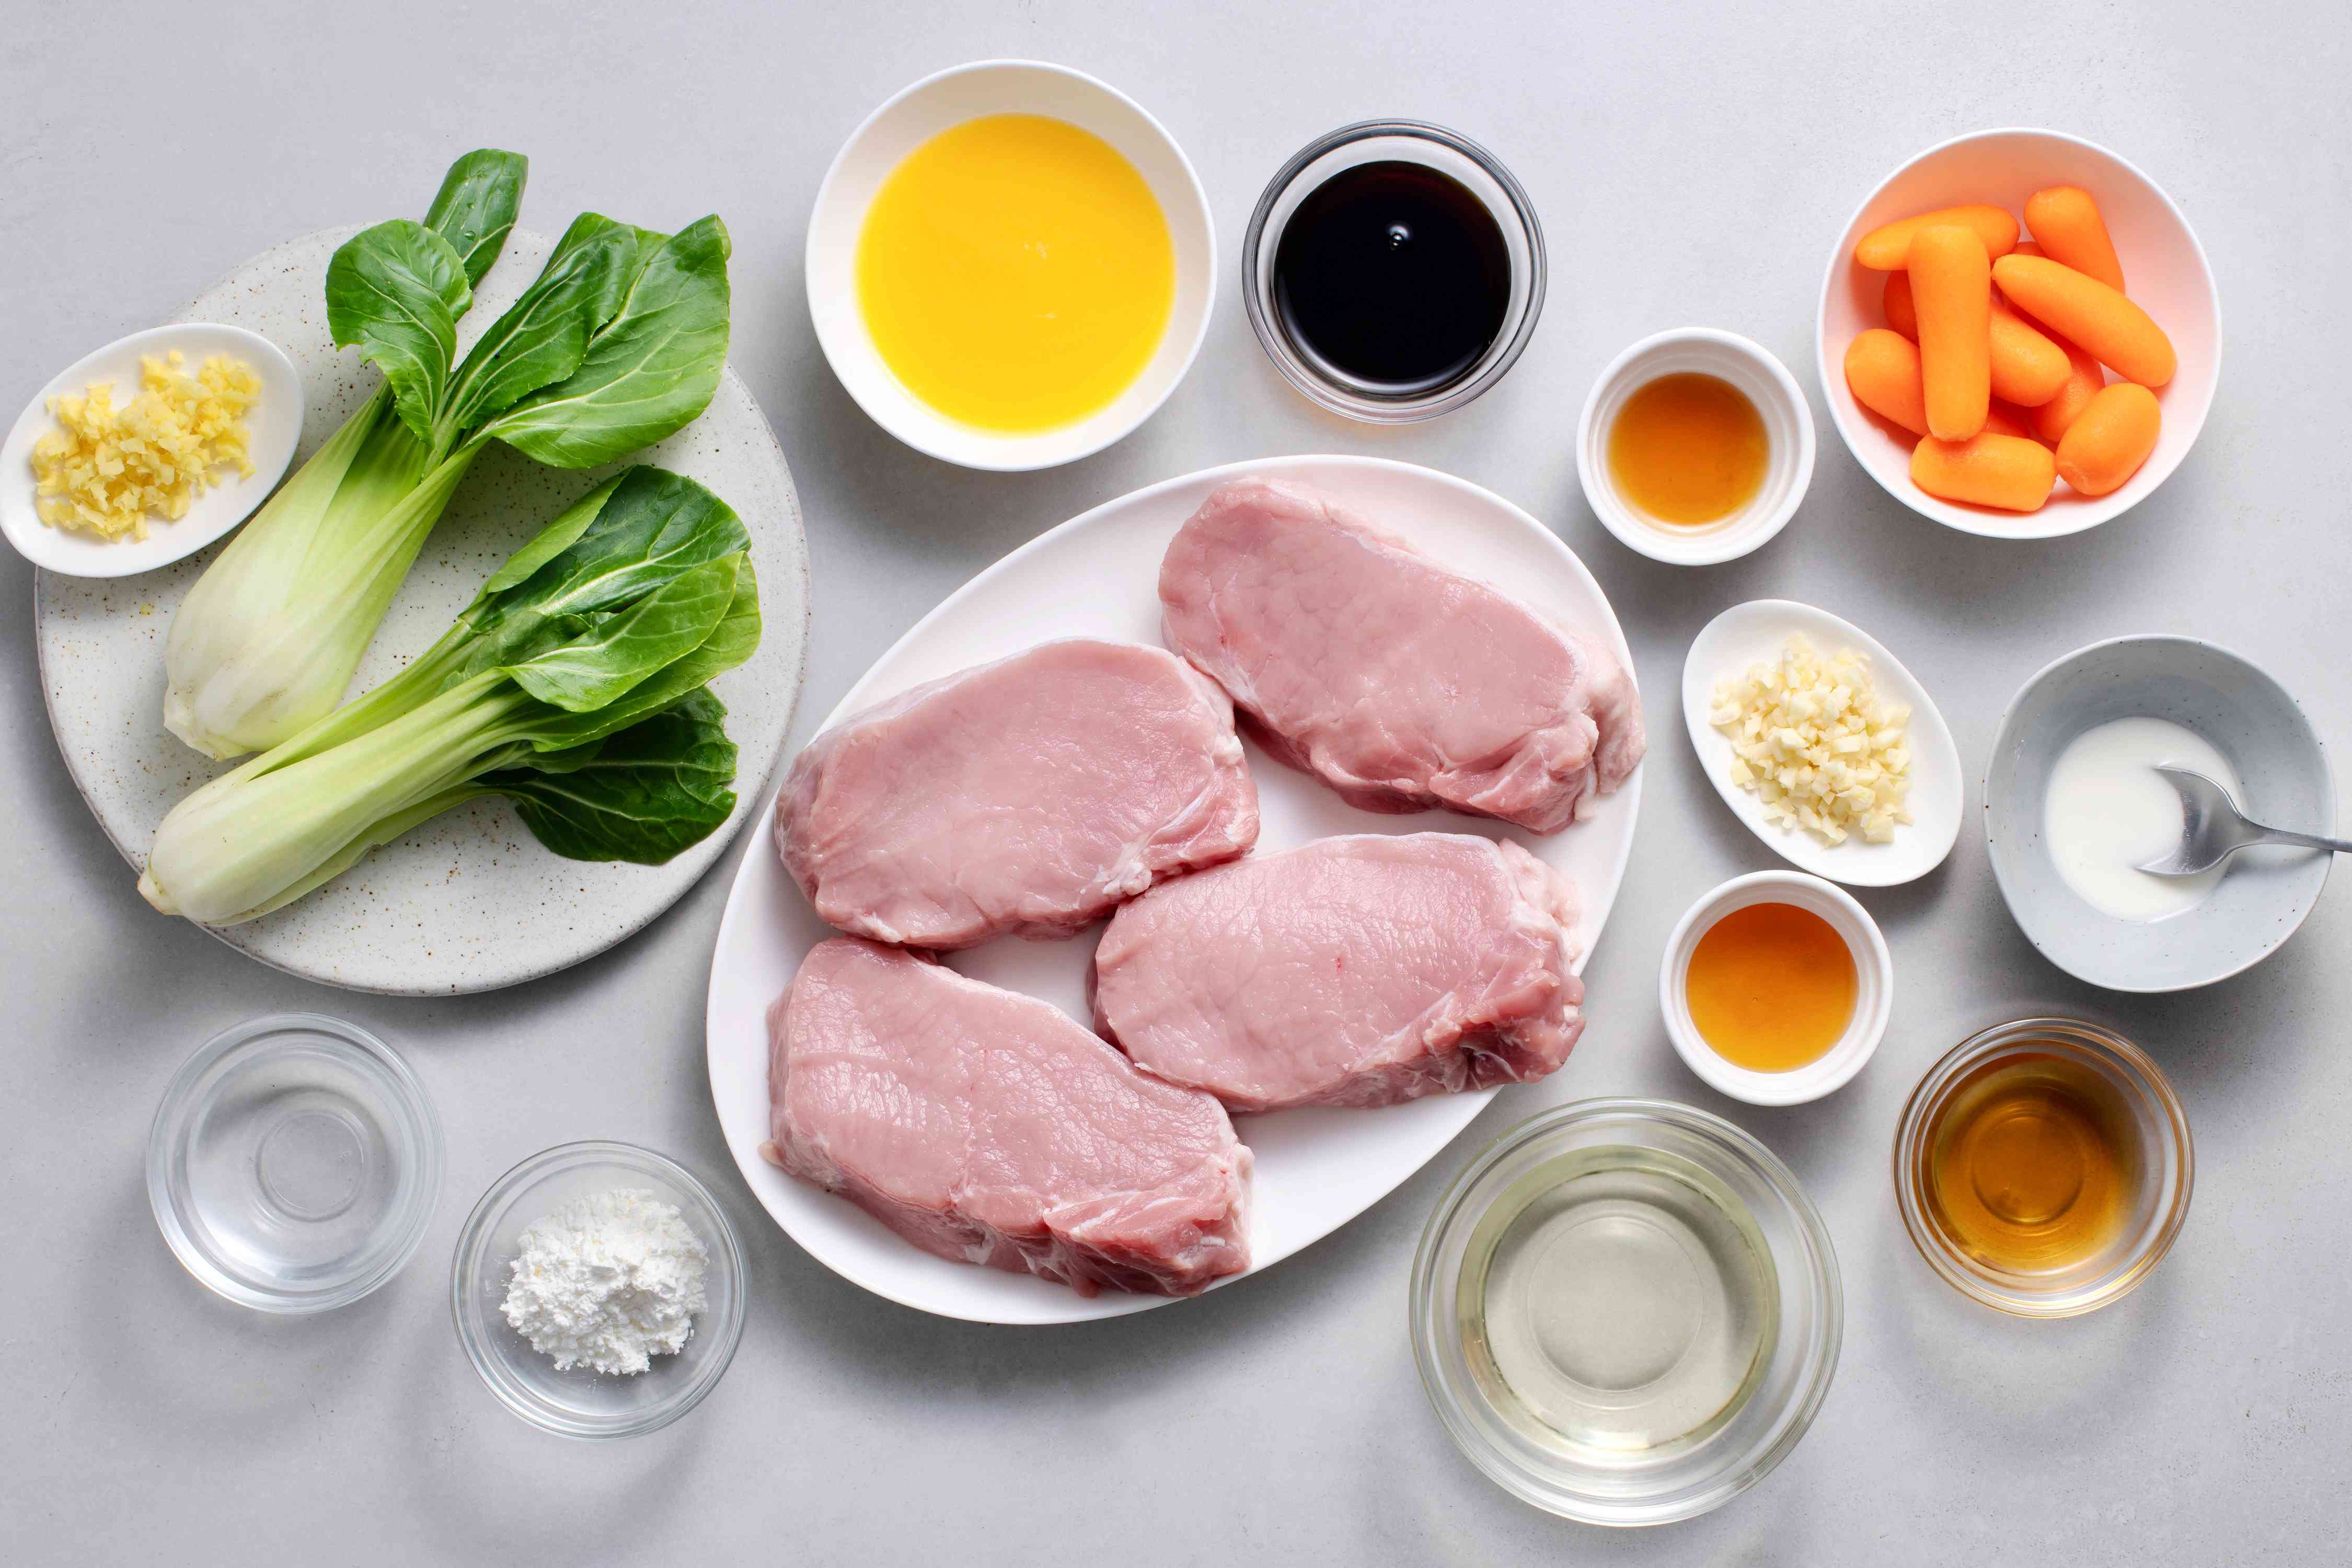 Chinese Orange Pork Chop Stir-fry ingredients